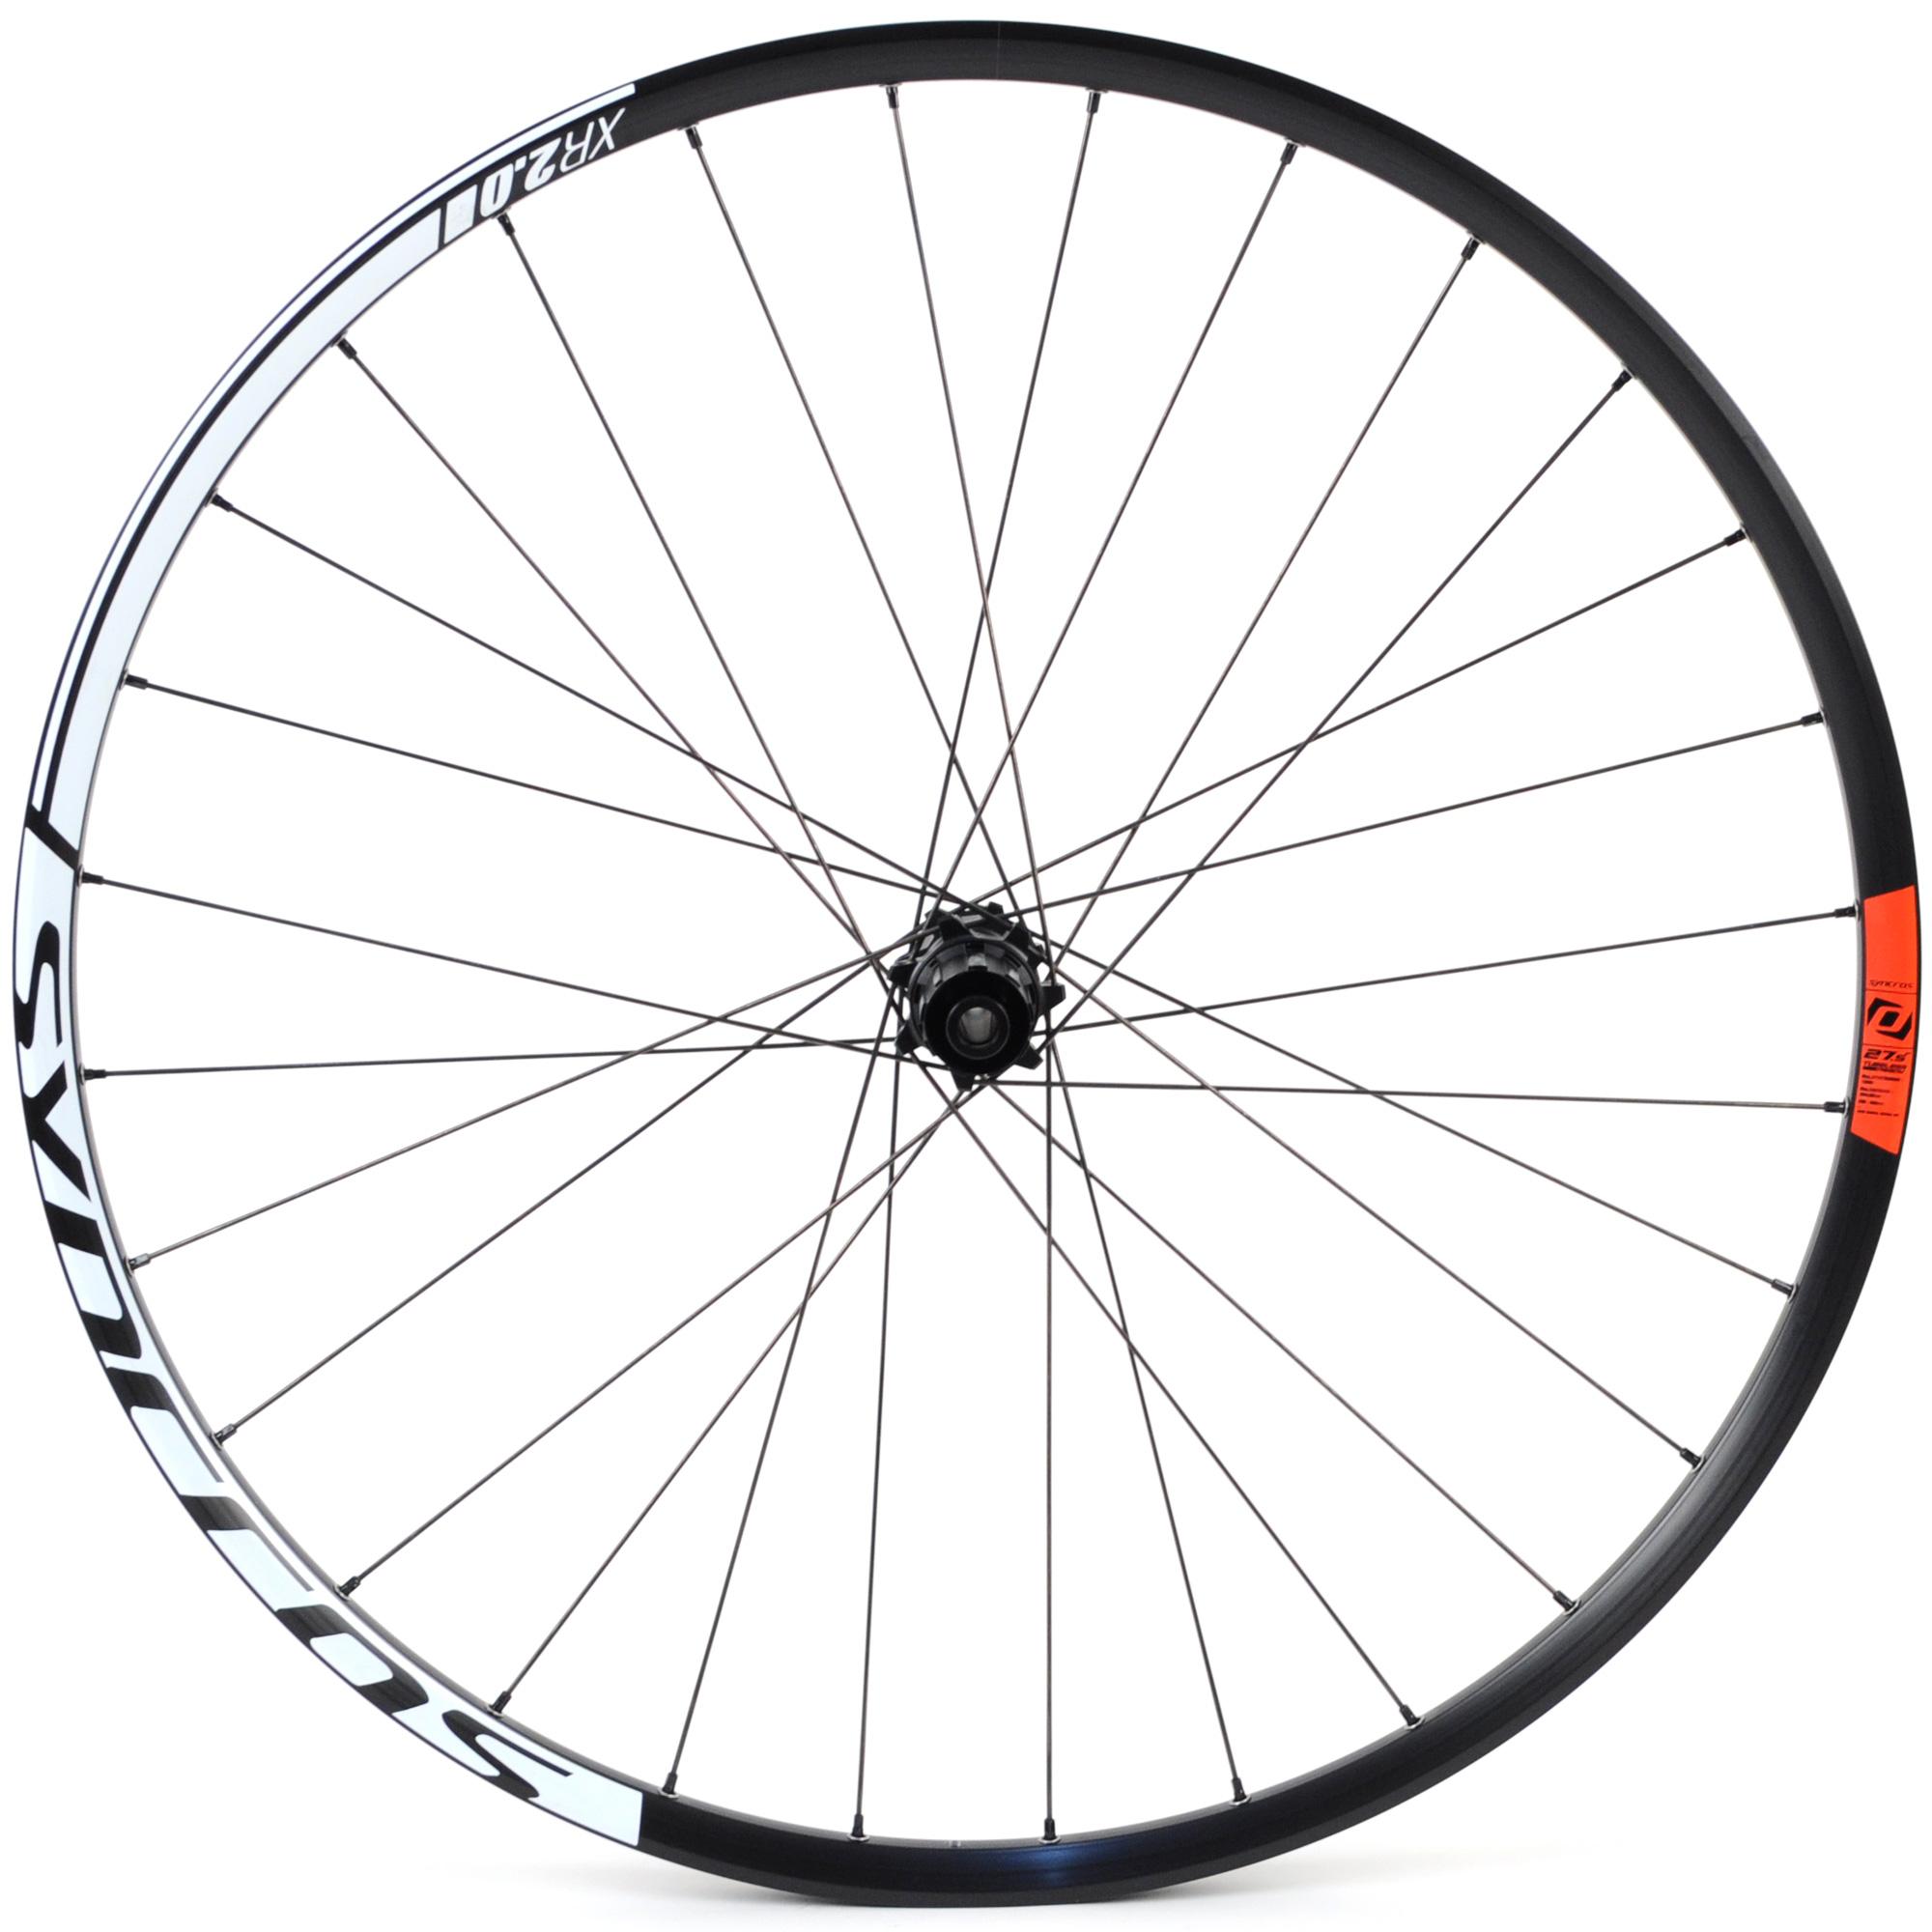 "DT Swiss Syncros XR2.0 27.5"" Mountain Bike TLR Wheelset"